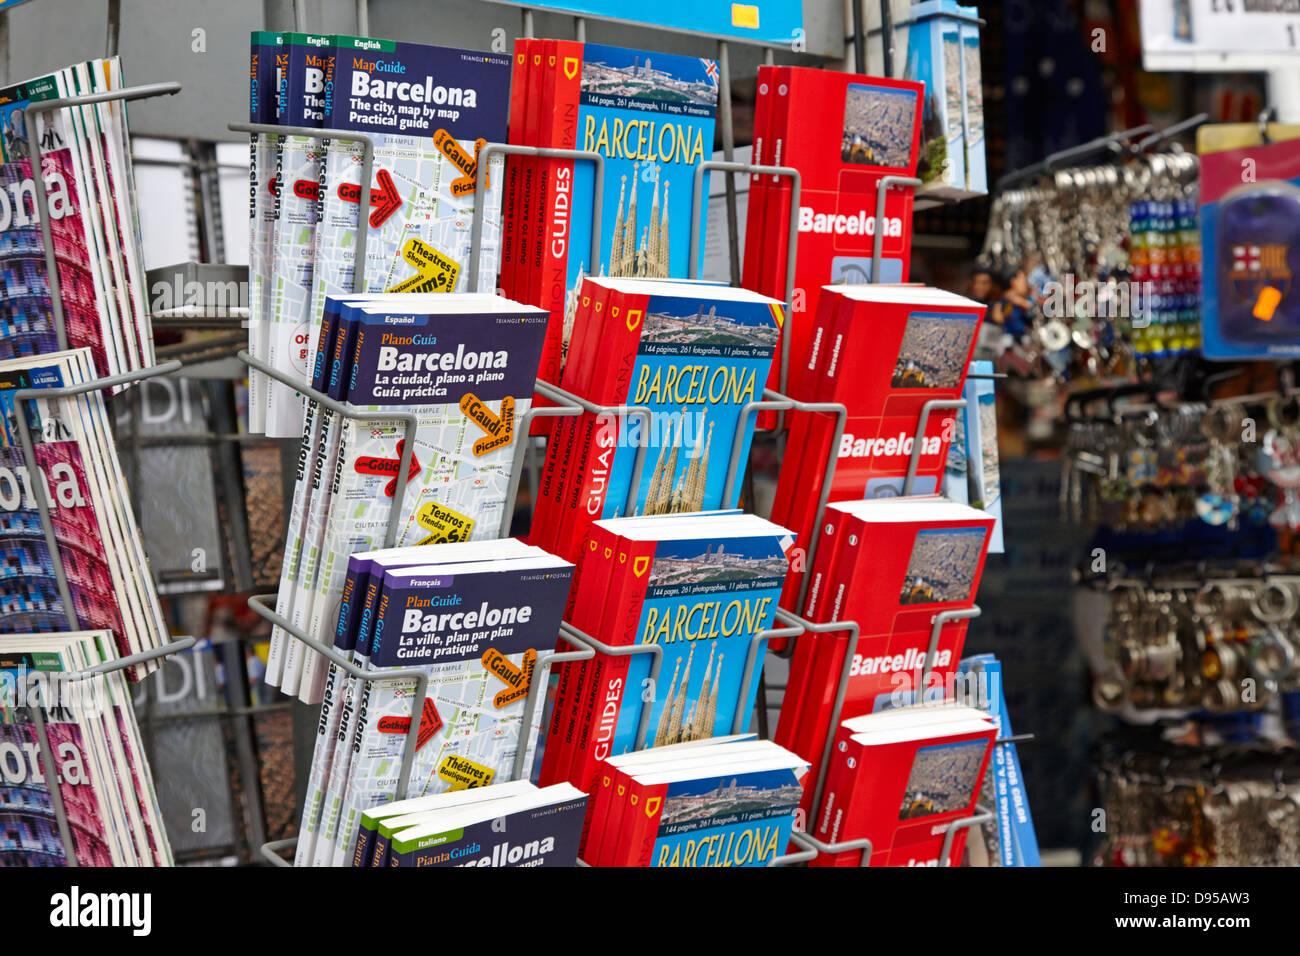 barcelona guidebooks in english italian german and russian catalonia spain - Stock Image